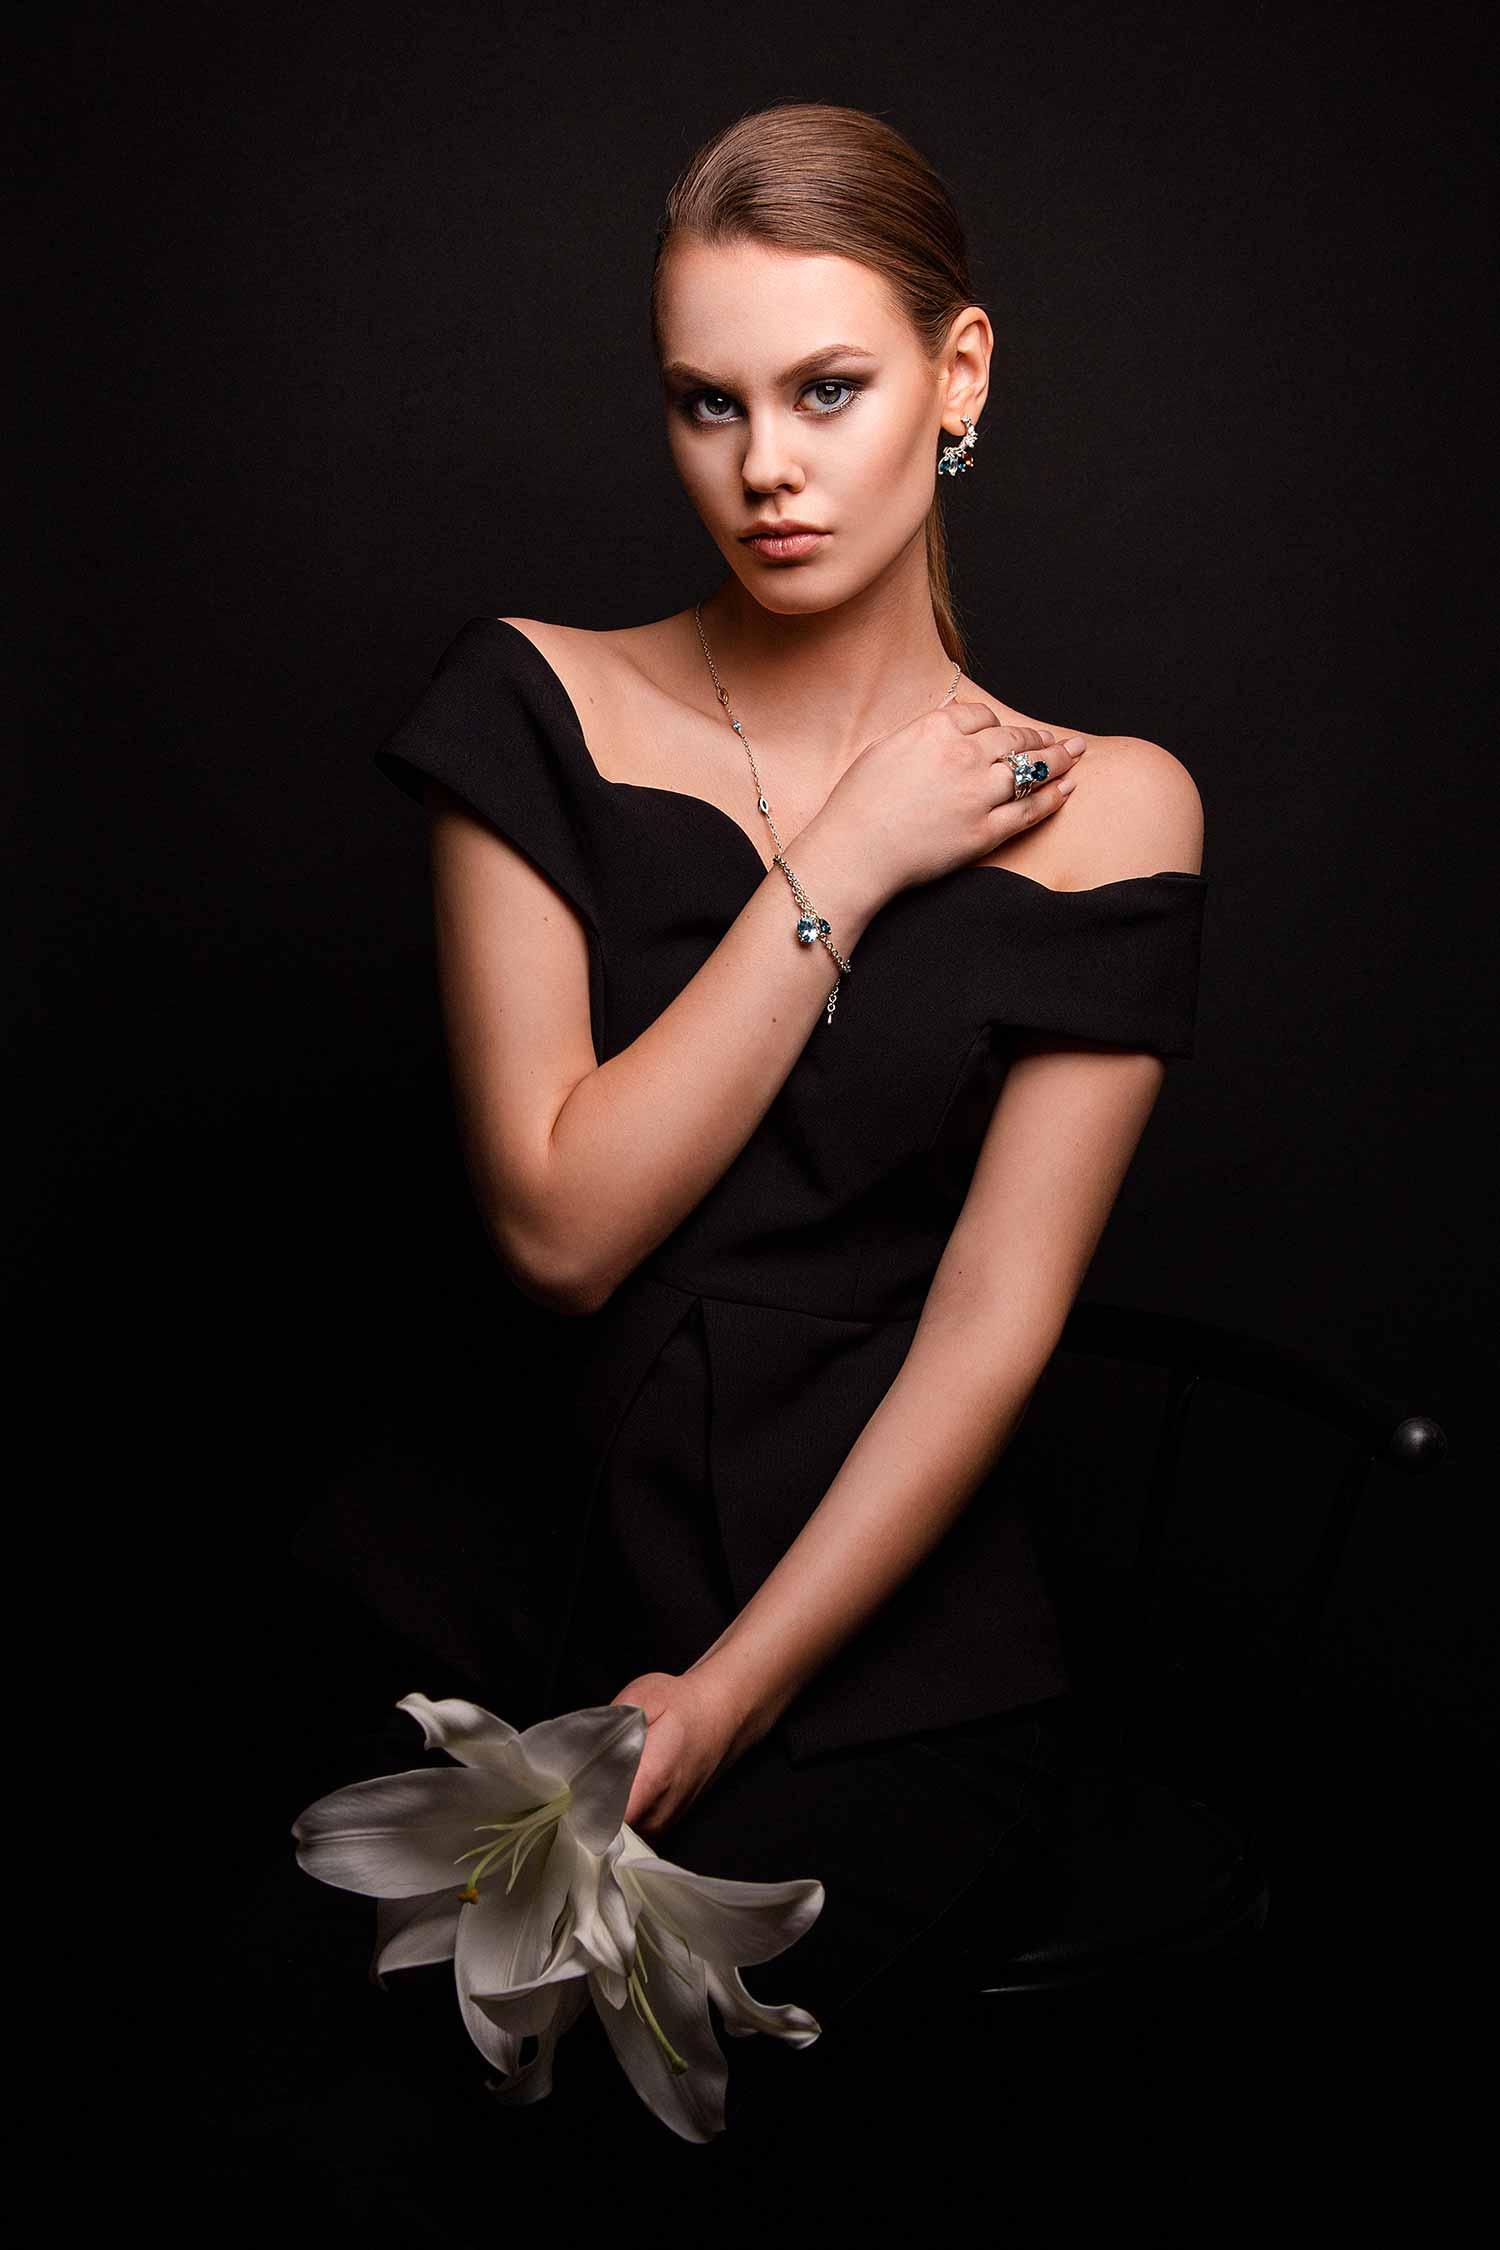 Model dressed in black elegant dress, holding lilies and wearing Zydrune gemstone jewelry.